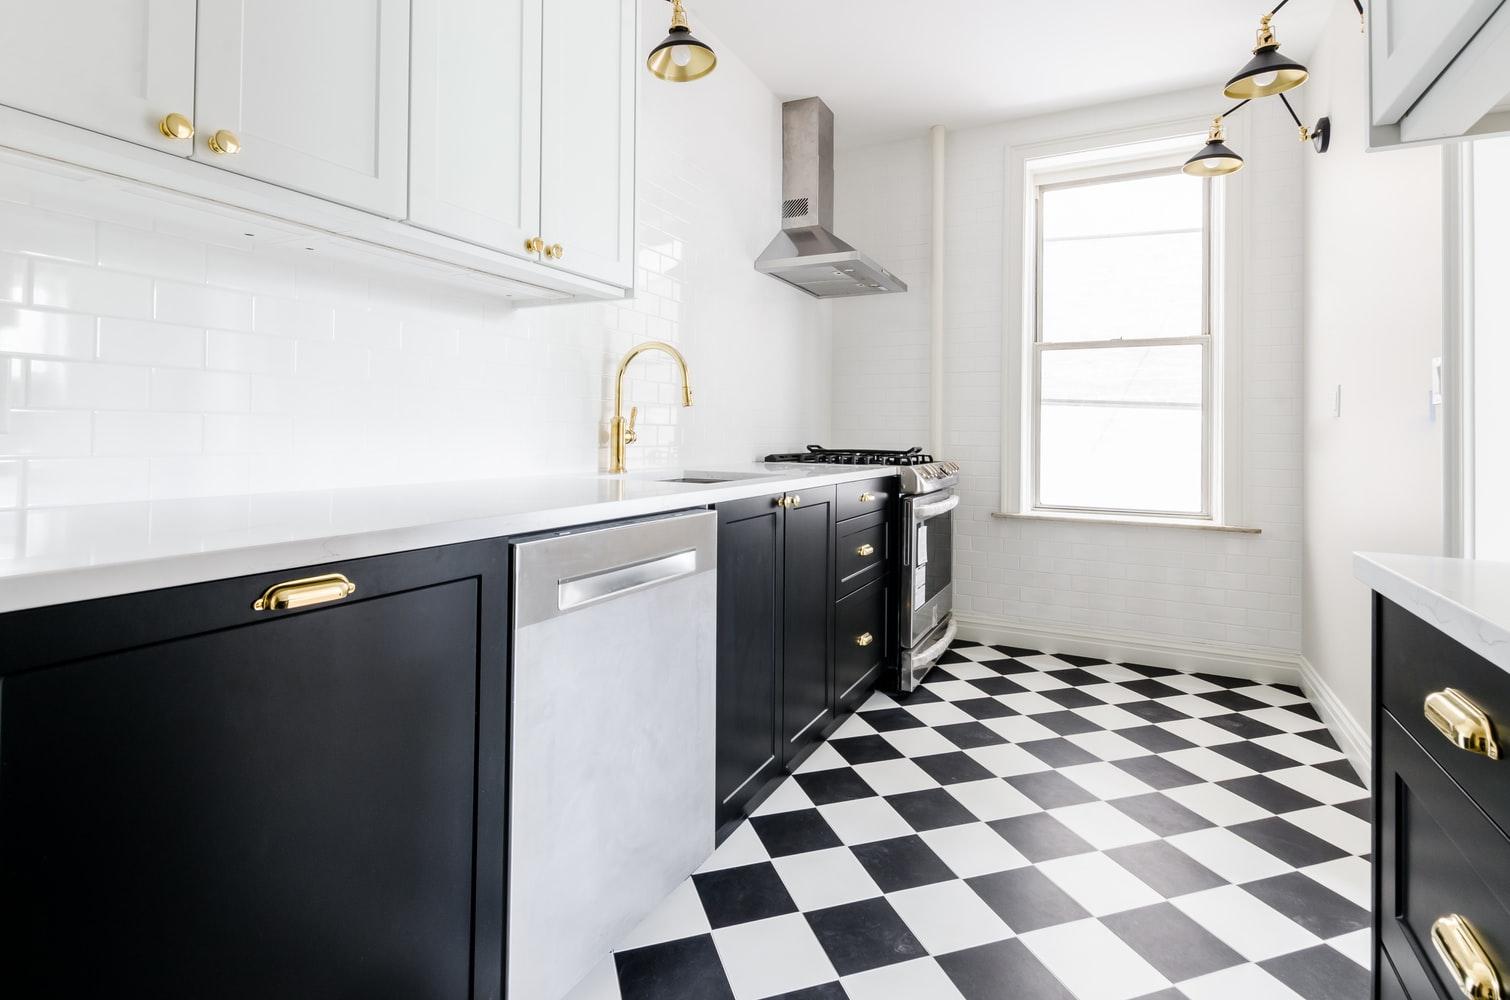 dishwasher door not aligned properly